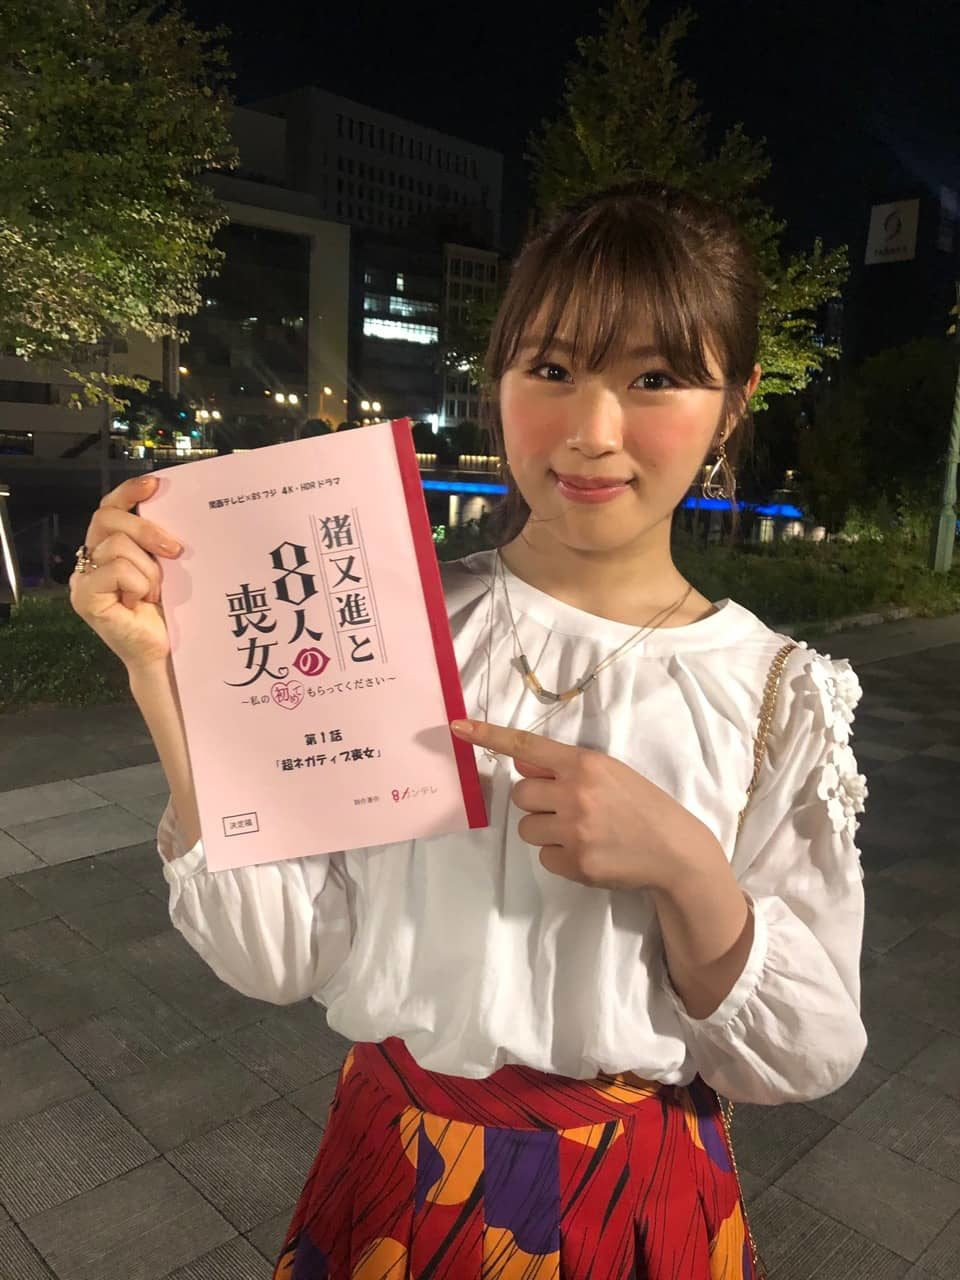 NMB48 渋谷凪咲が出演! カンテレ「猪又進と8人の喪女」第1話:超ネガティブ喪女 [10/24 24:55~]